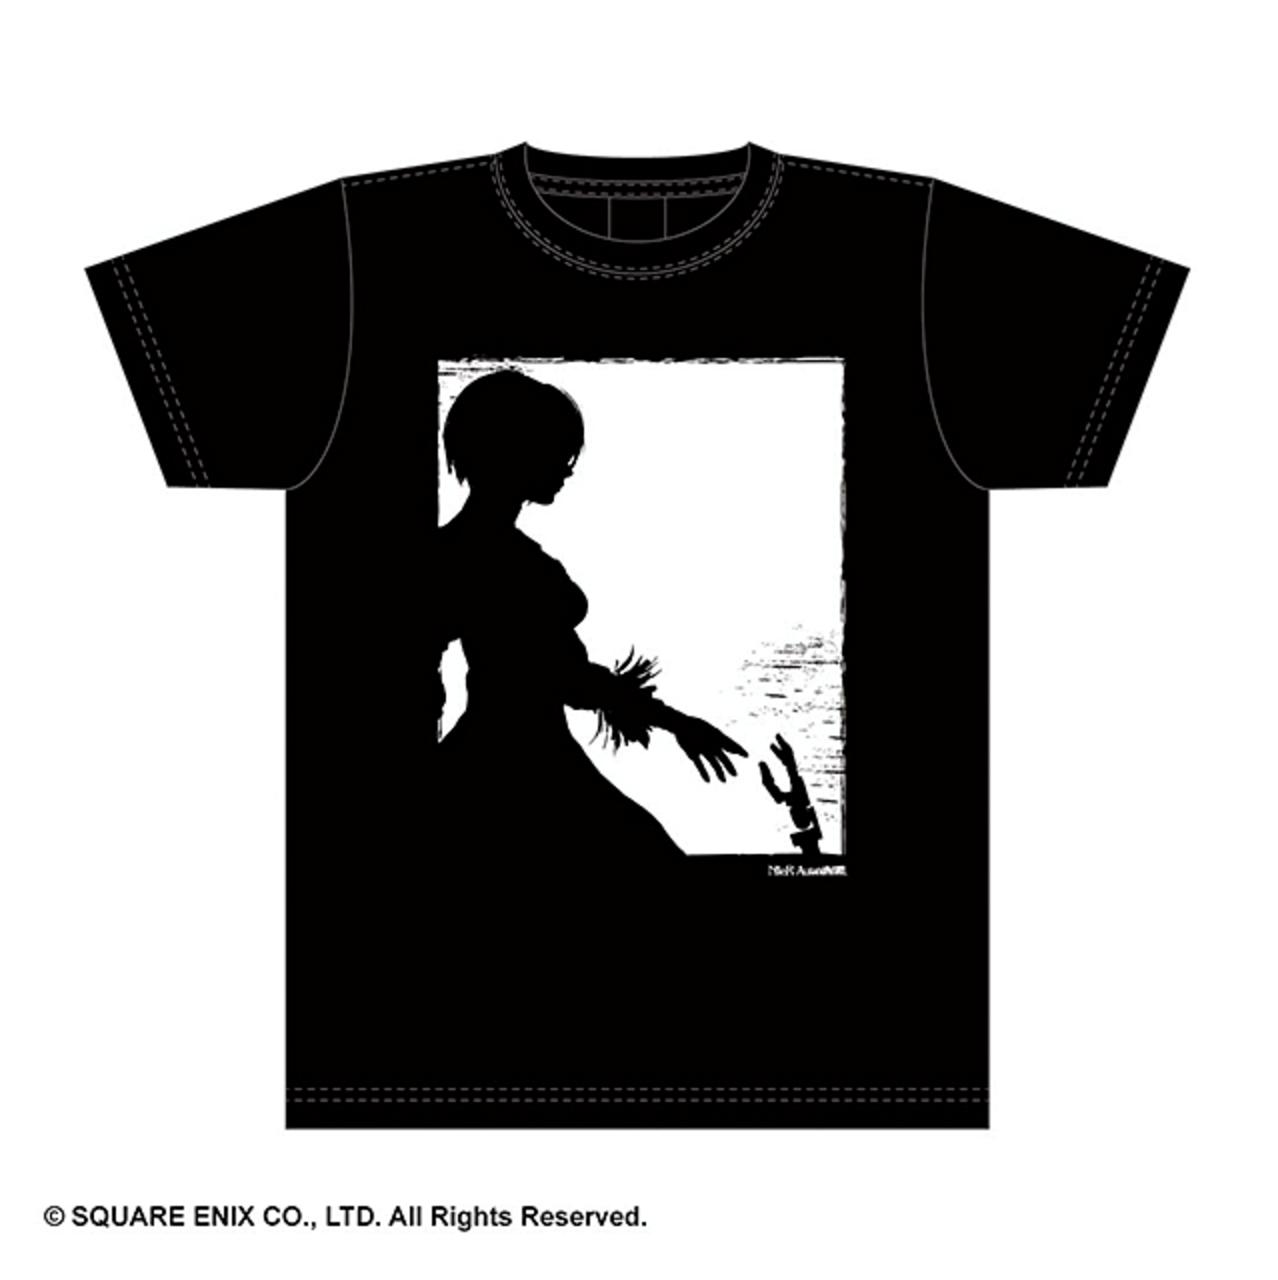 Aitaikuji Nier Automata Square Enix Store Exclusive T Shirt